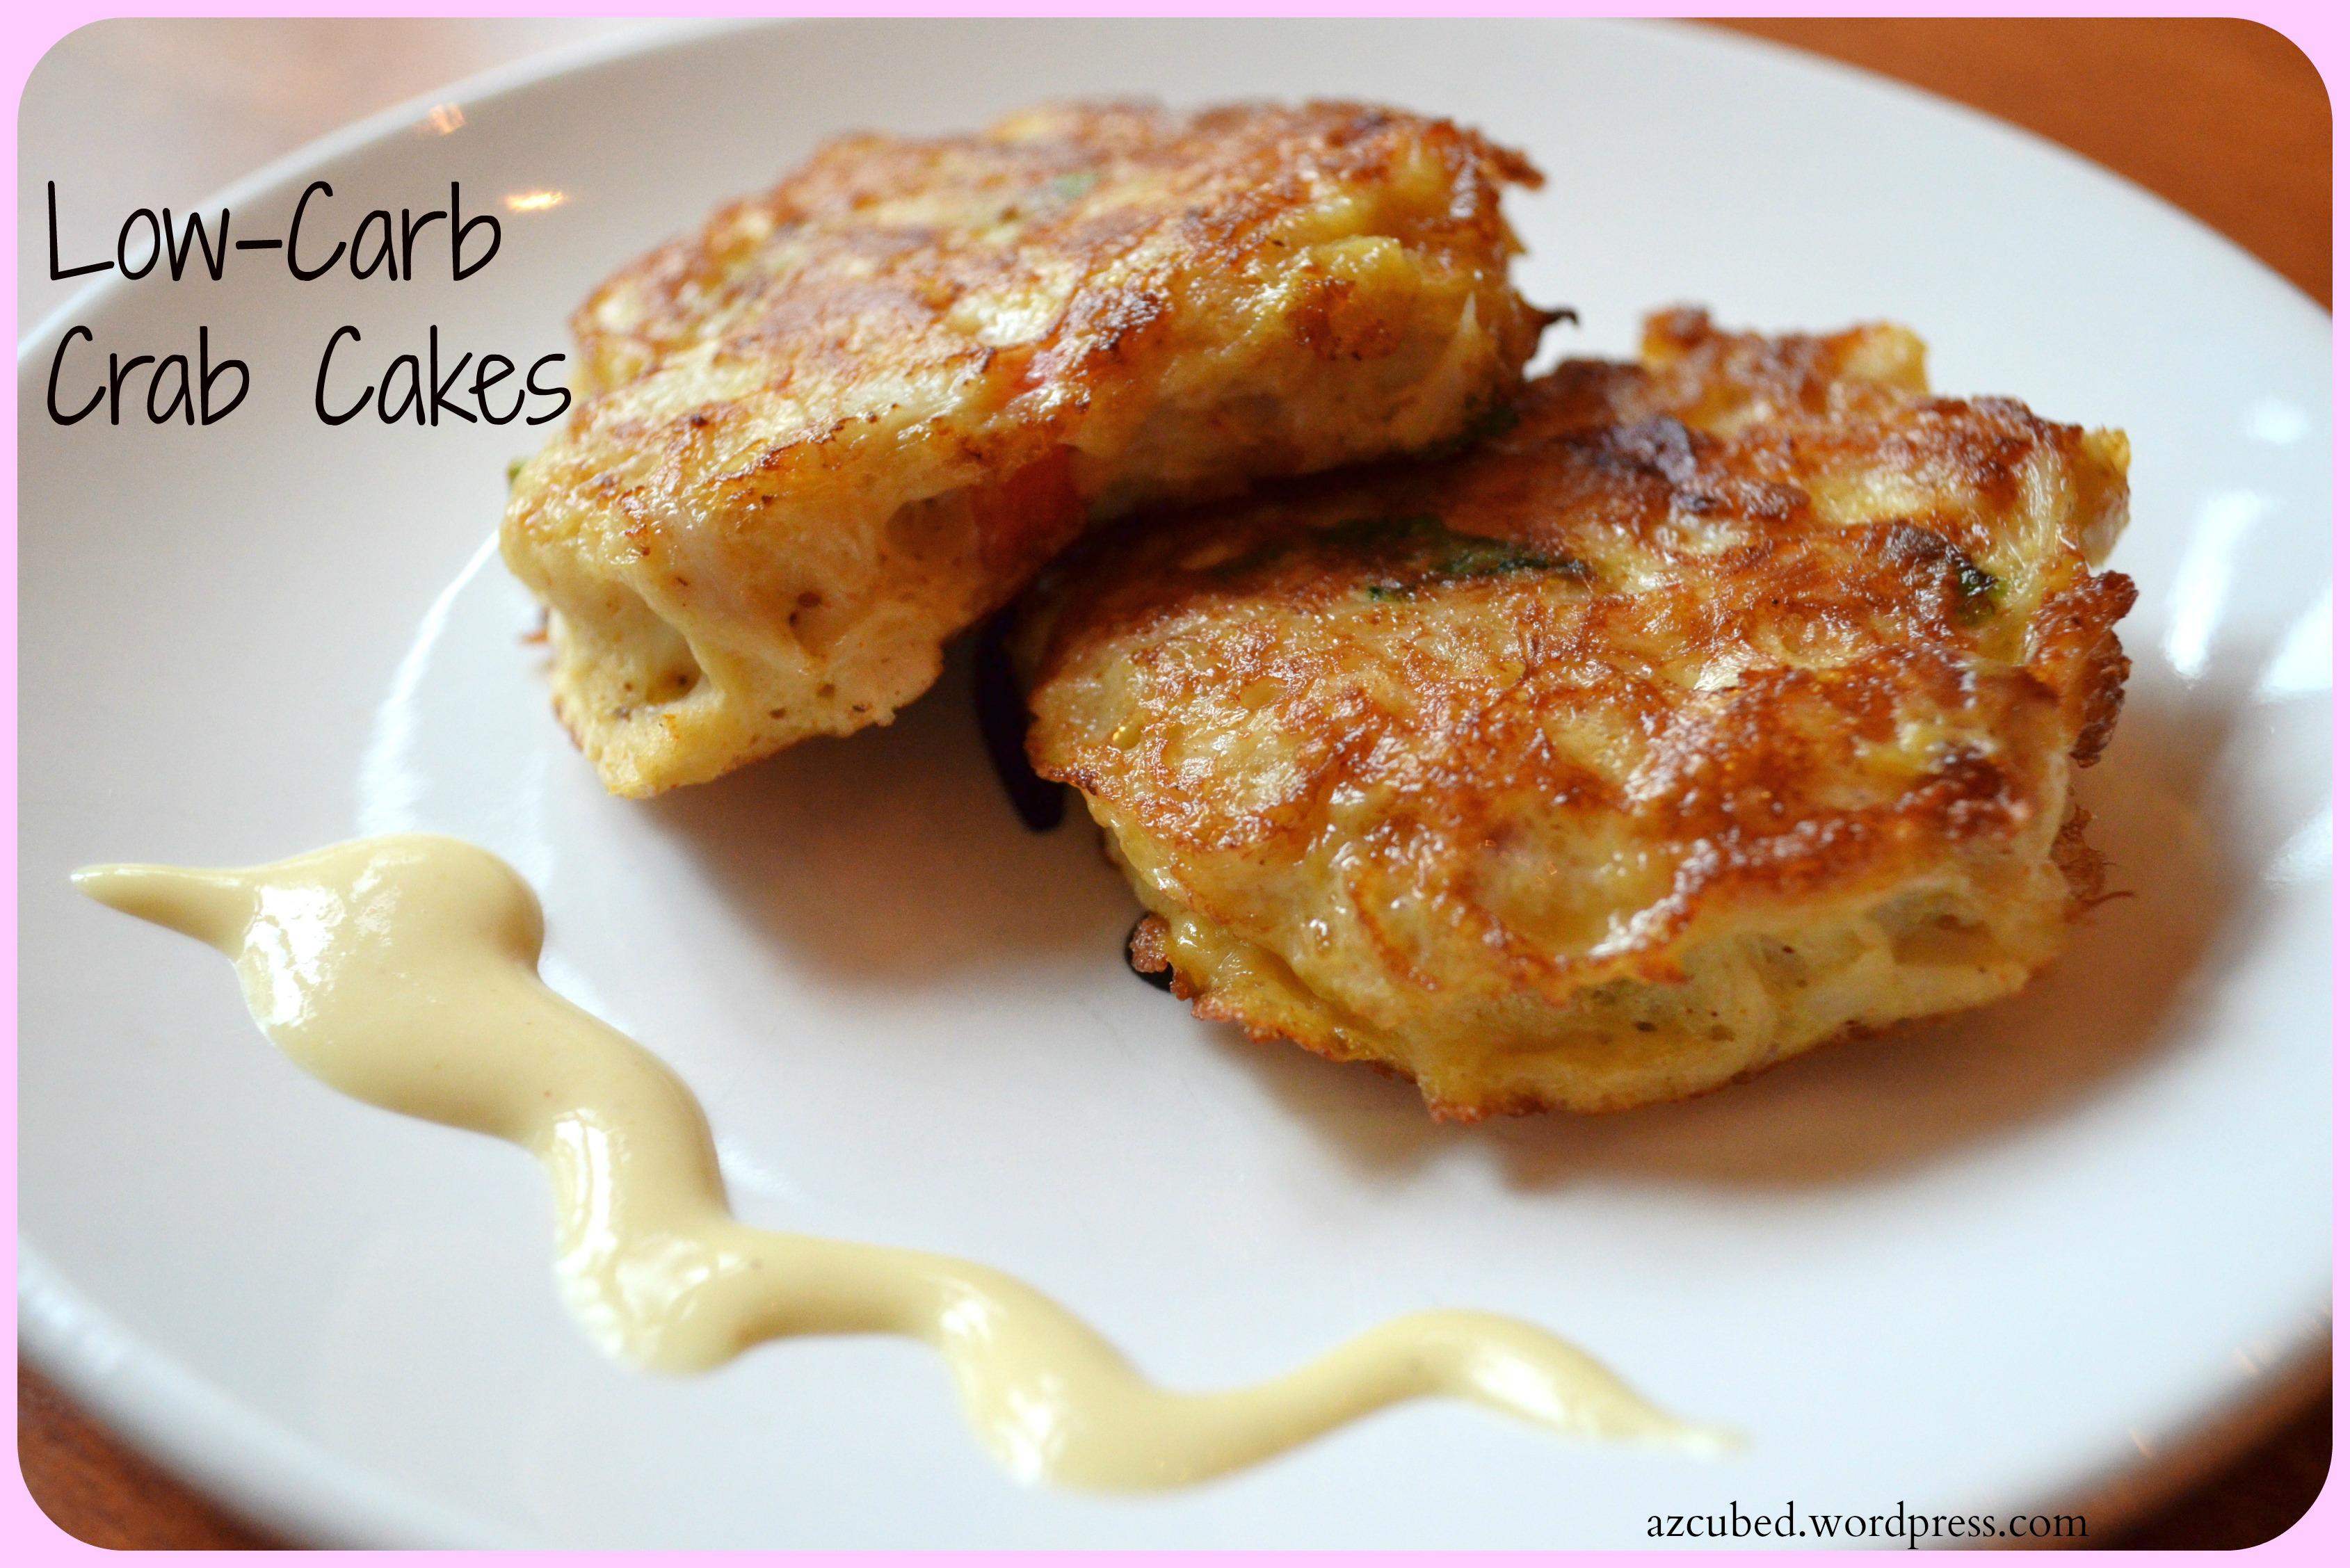 Crab Cake Recipe Low Calorie: Low Carb Crab Cakes With Mustard Sauce • Domestic Superhero